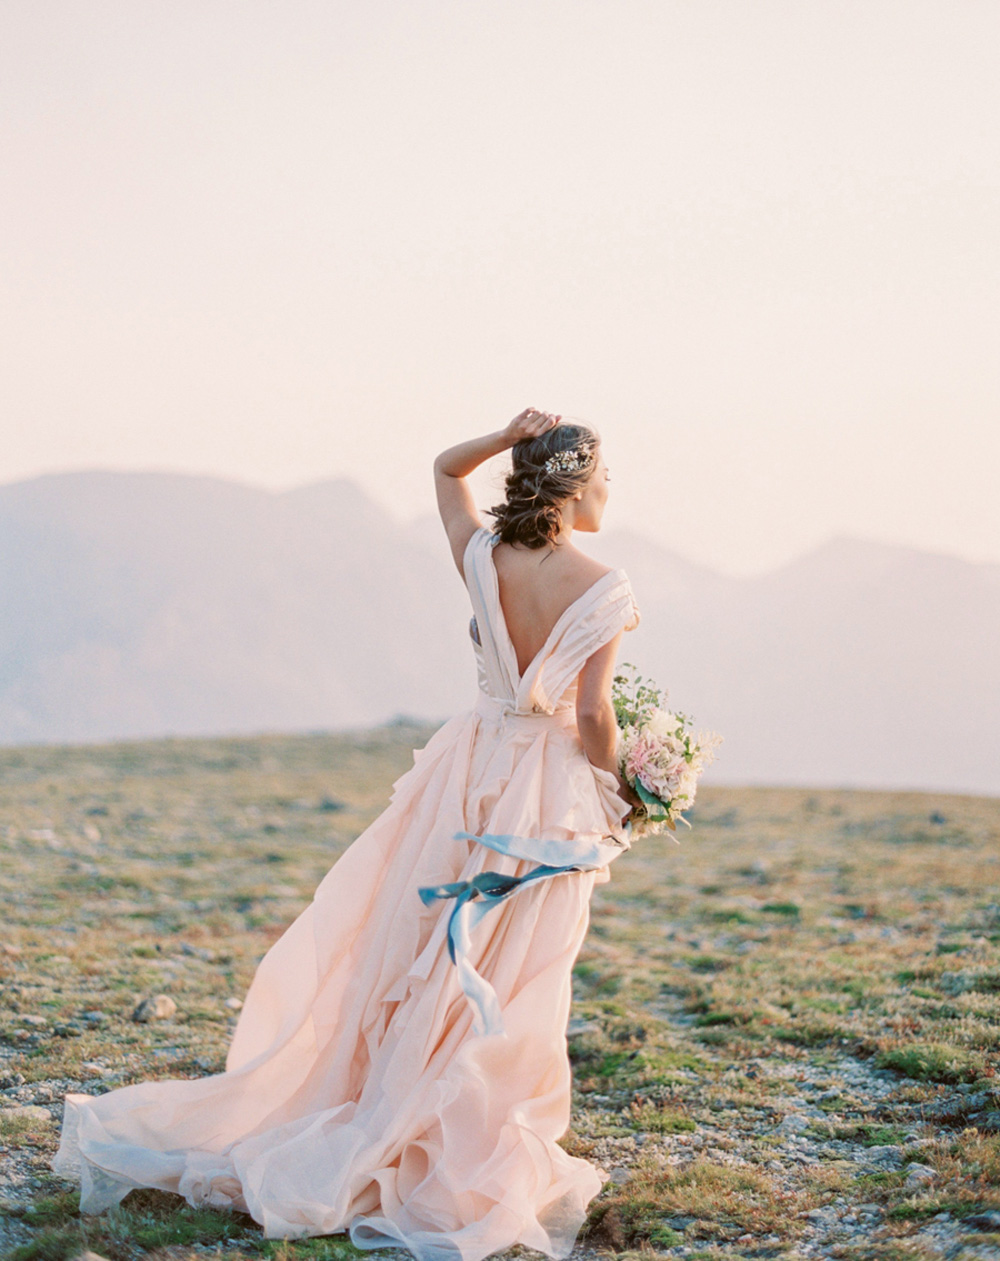 wedding_photographer_telluride.jpg